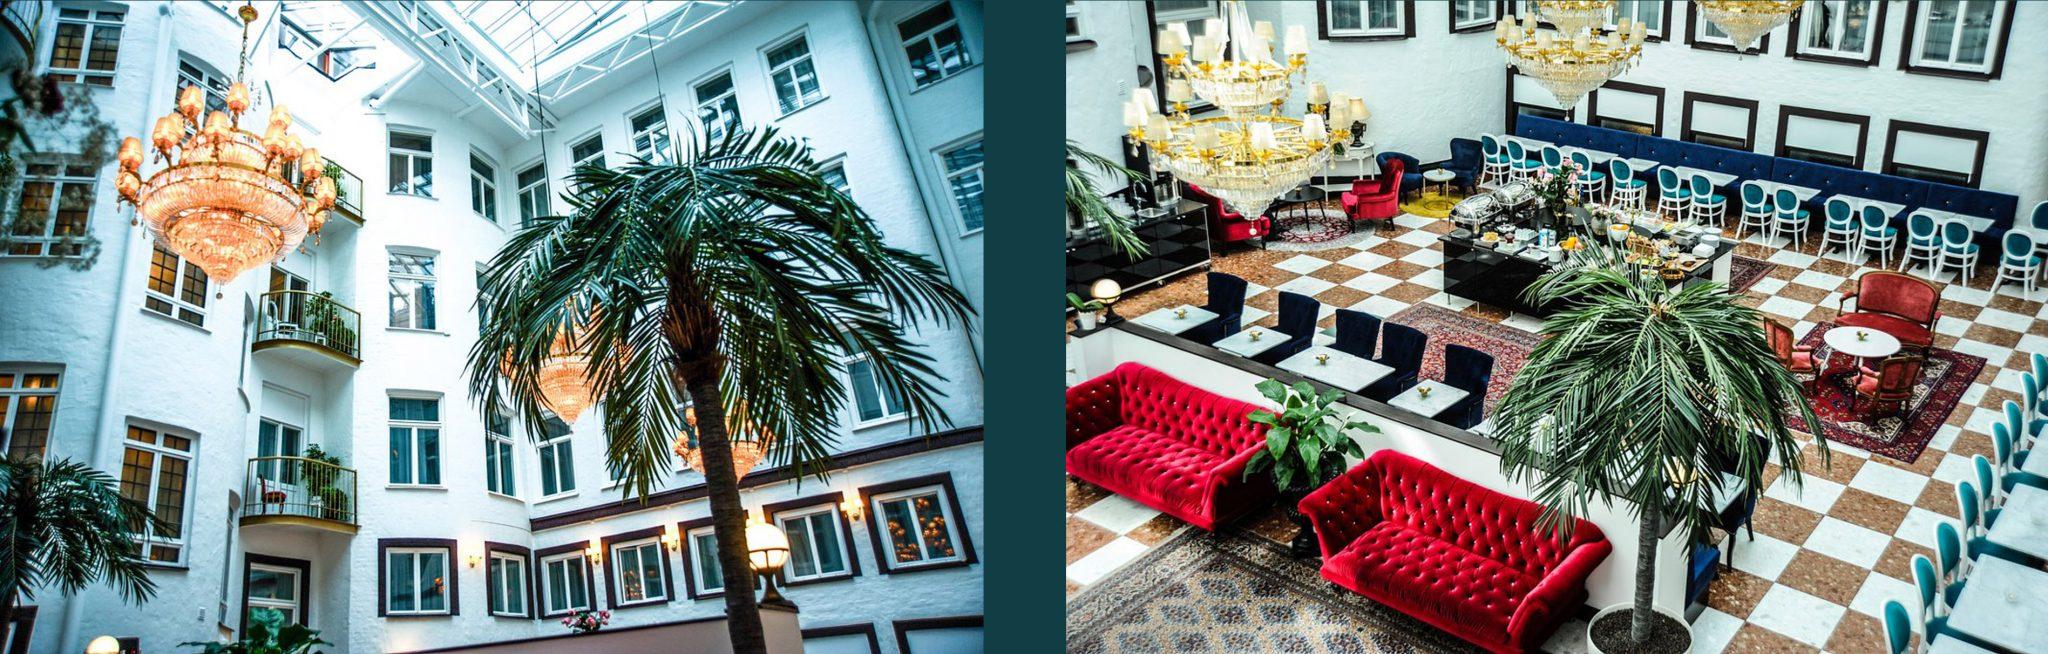 Inglasad innergård i Best Western Hotel Bentleys i Stockholm ritat av Rex Arkitektbyrå